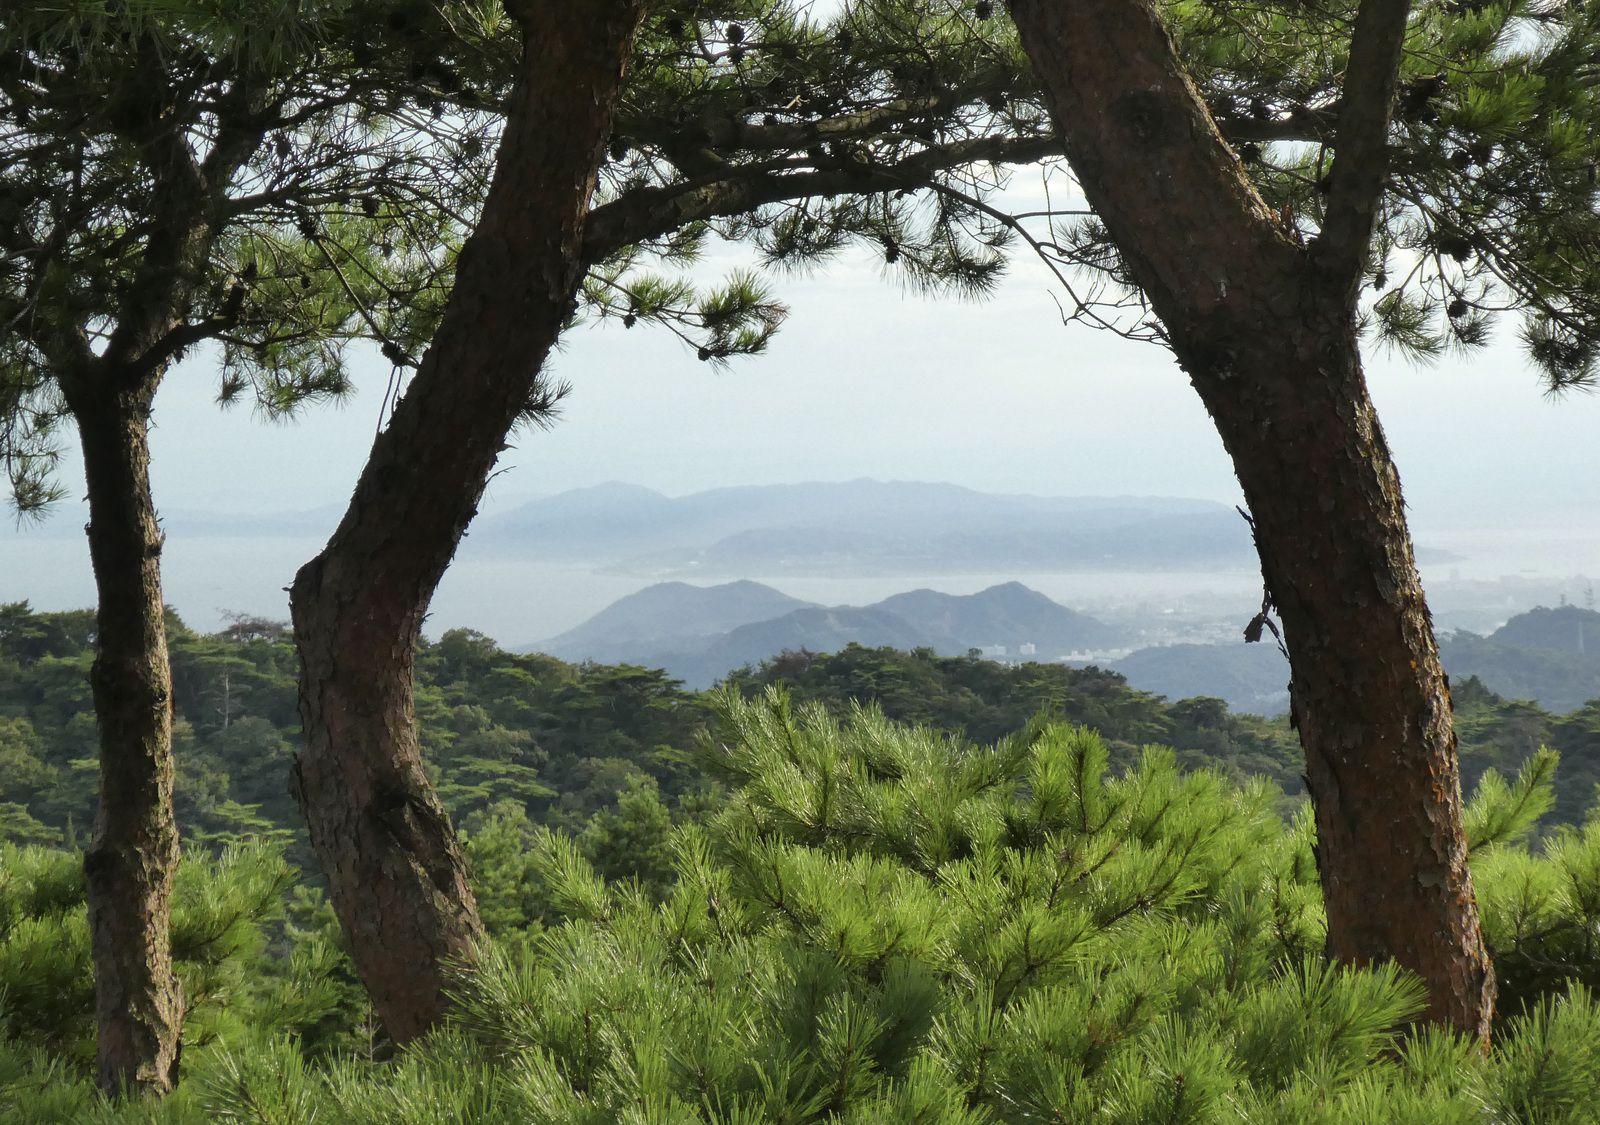 Kobé: Le mont Maya 摩耶山